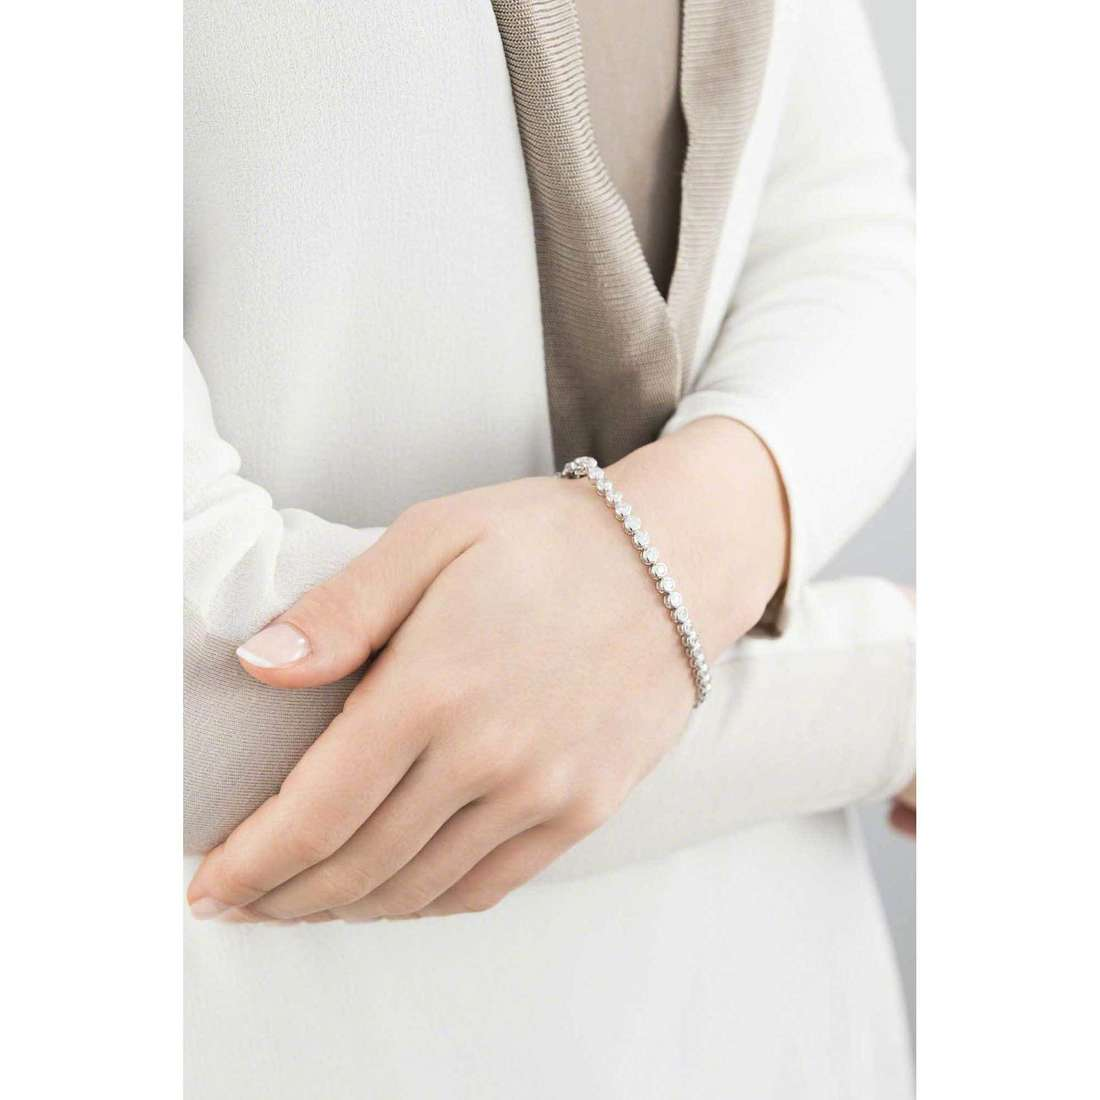 GioiaPura bracciali donna 2702-01-18 indosso